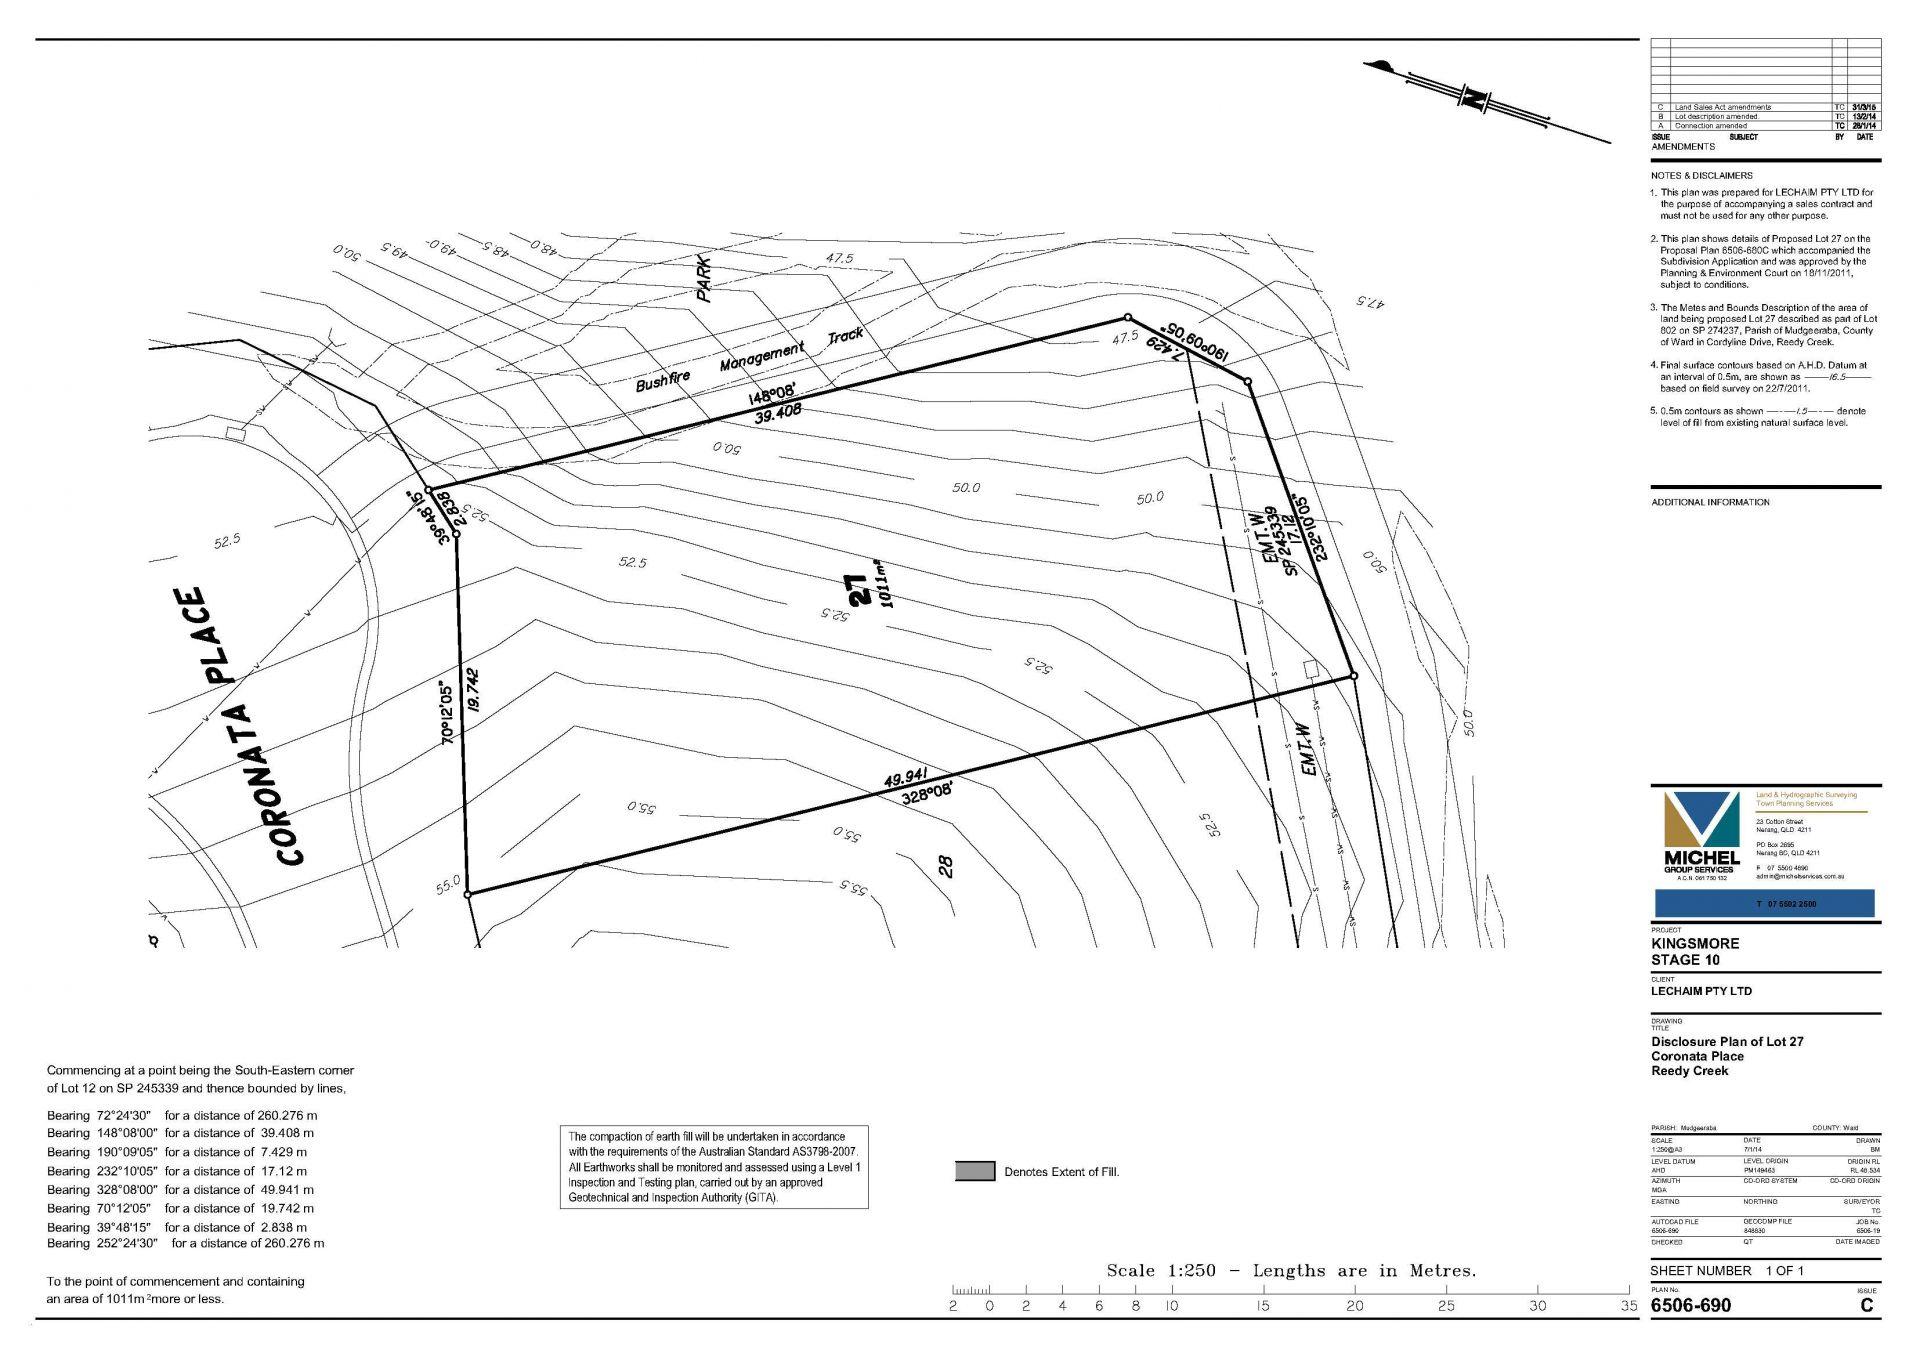 REEDY CREEK, QLD 4227